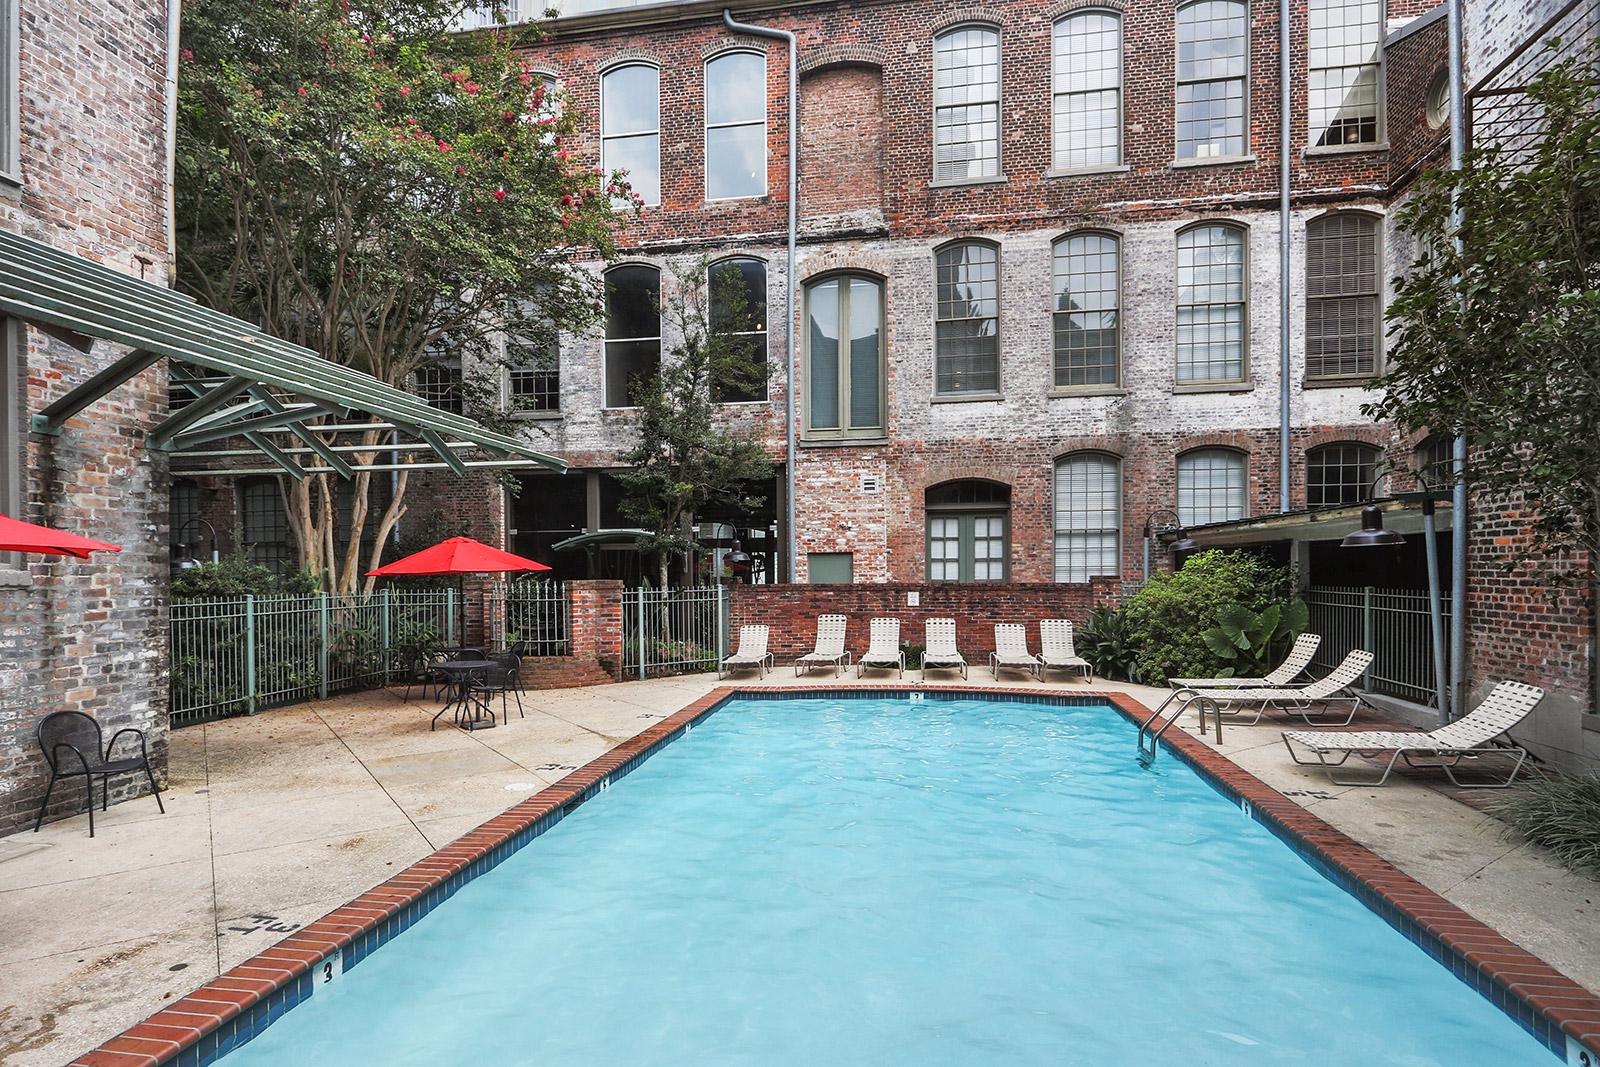 CBD/Warehouse District/South Market, Condo, 1 beds, 1.0 baths, $2400 per month New Orleans Rental - devie image_8